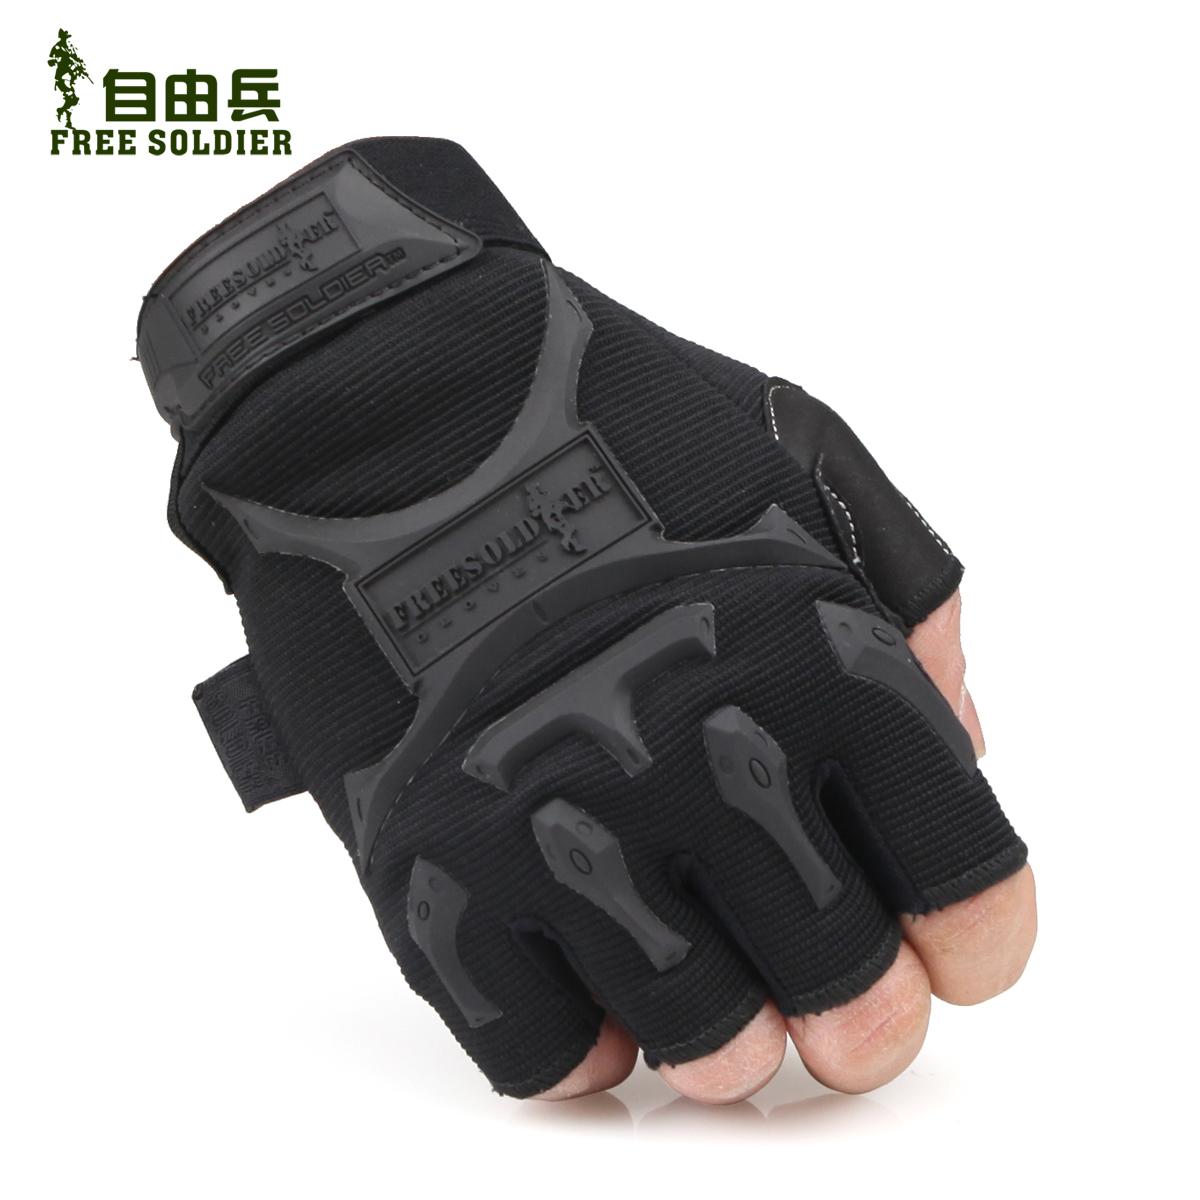 Перчатки для туризма и кемпинга Free Soldier st023 Free Soldier / free soldiers